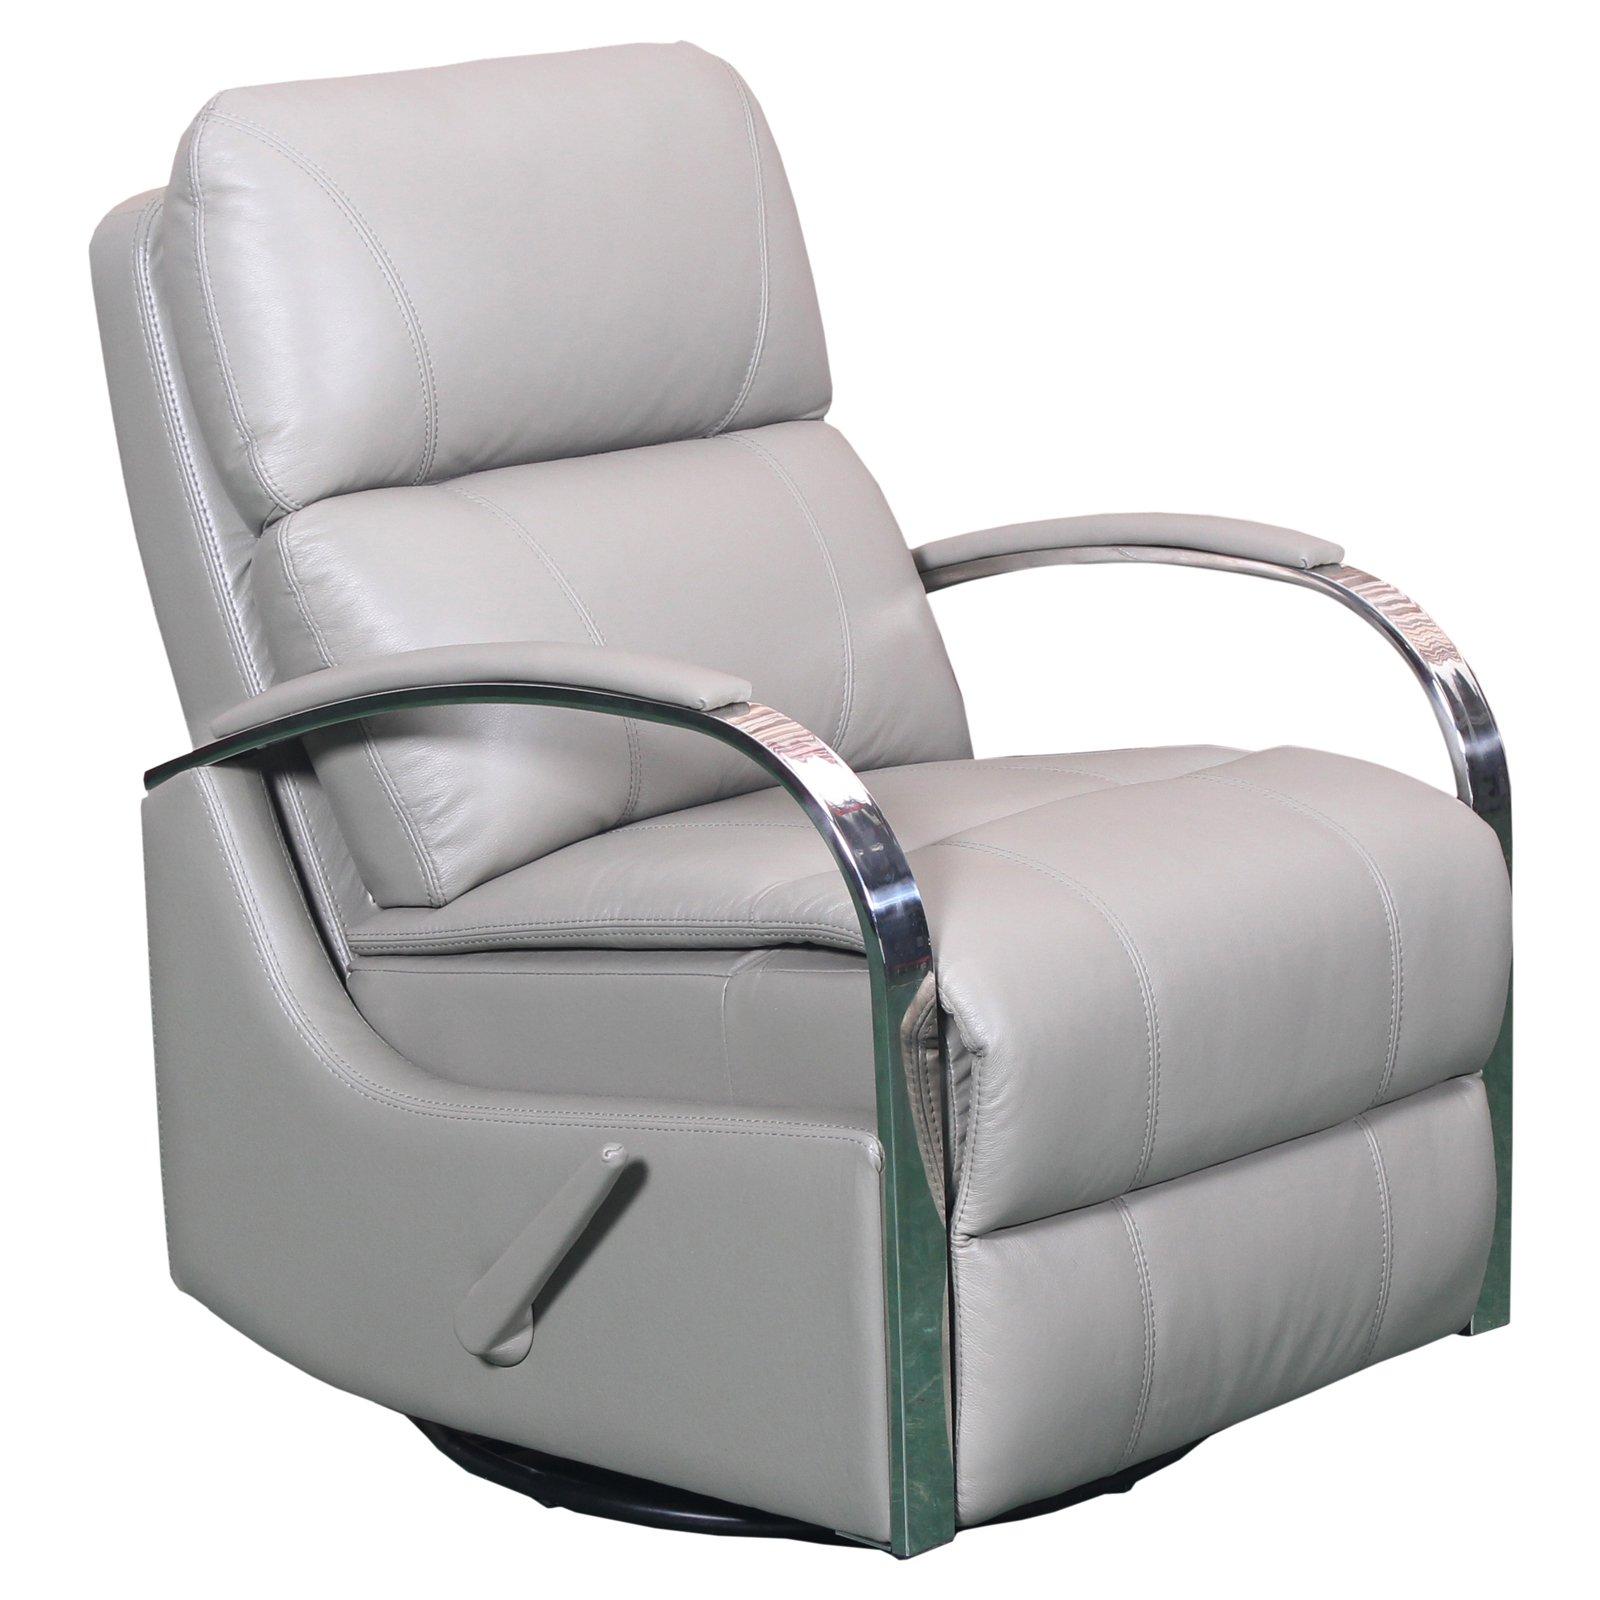 swivel chair regal staples chairs big and tall barcalounger glider recliner walmart com